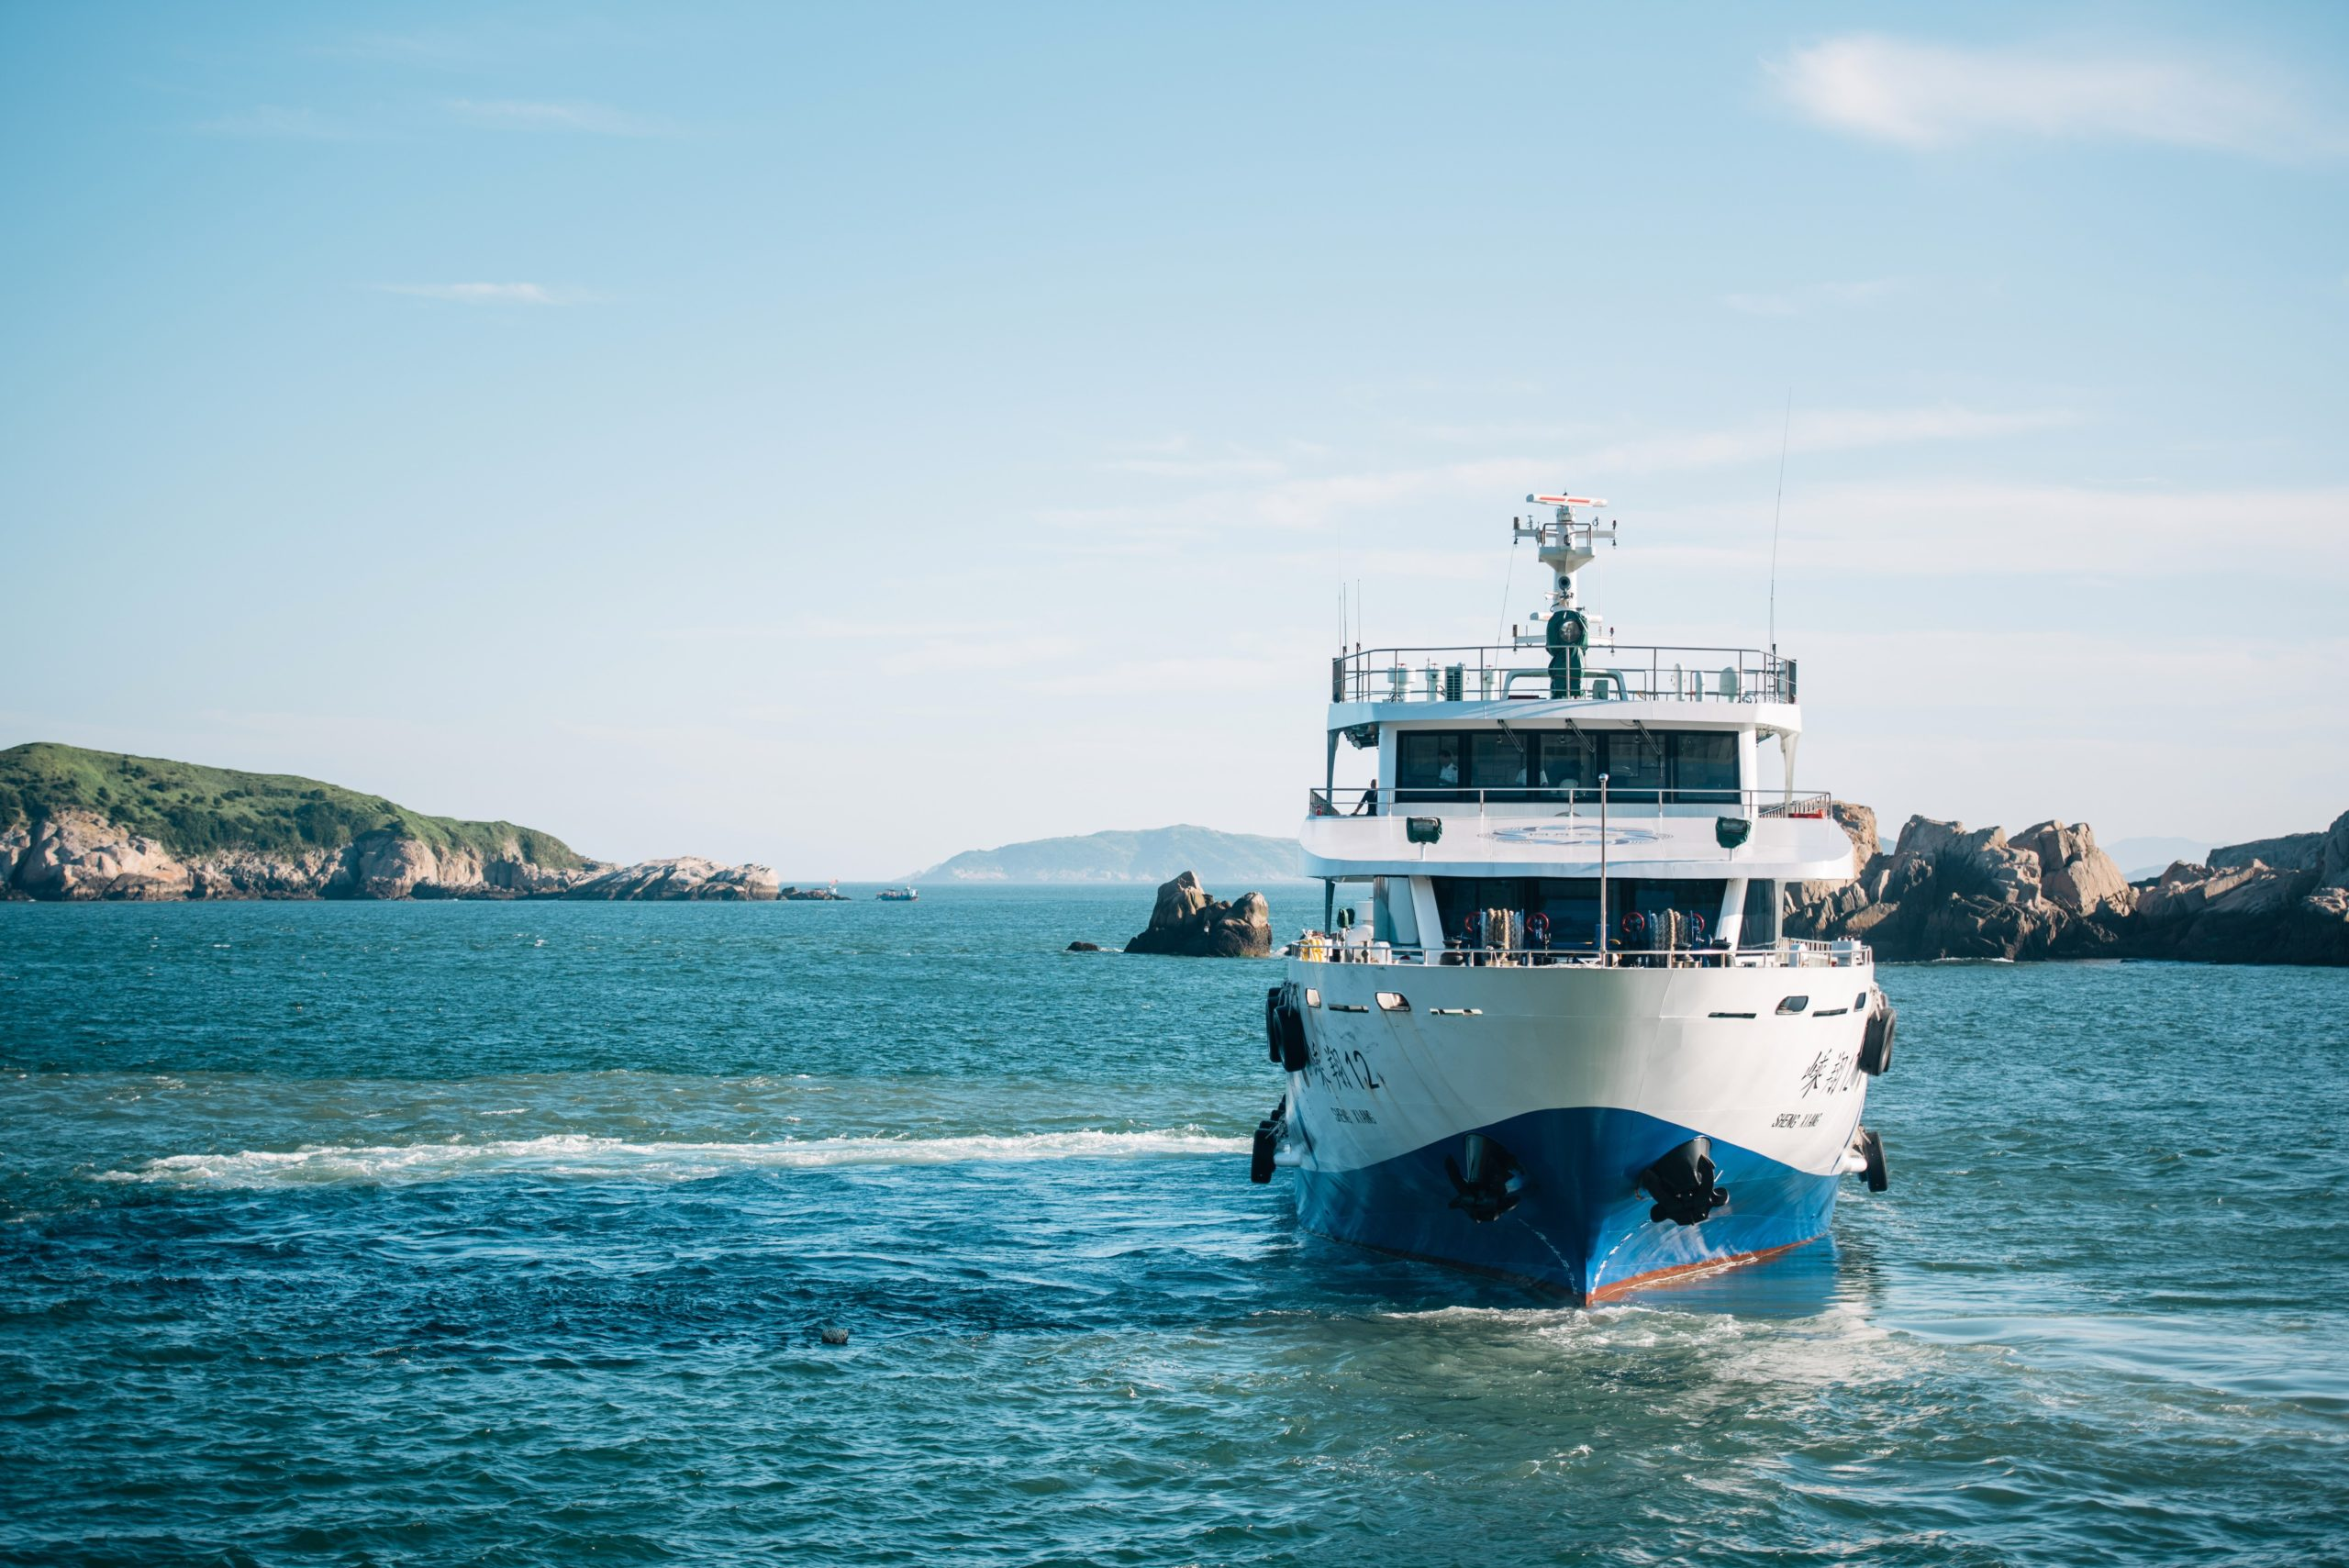 Stena Line 's new ferry Stena Scandica